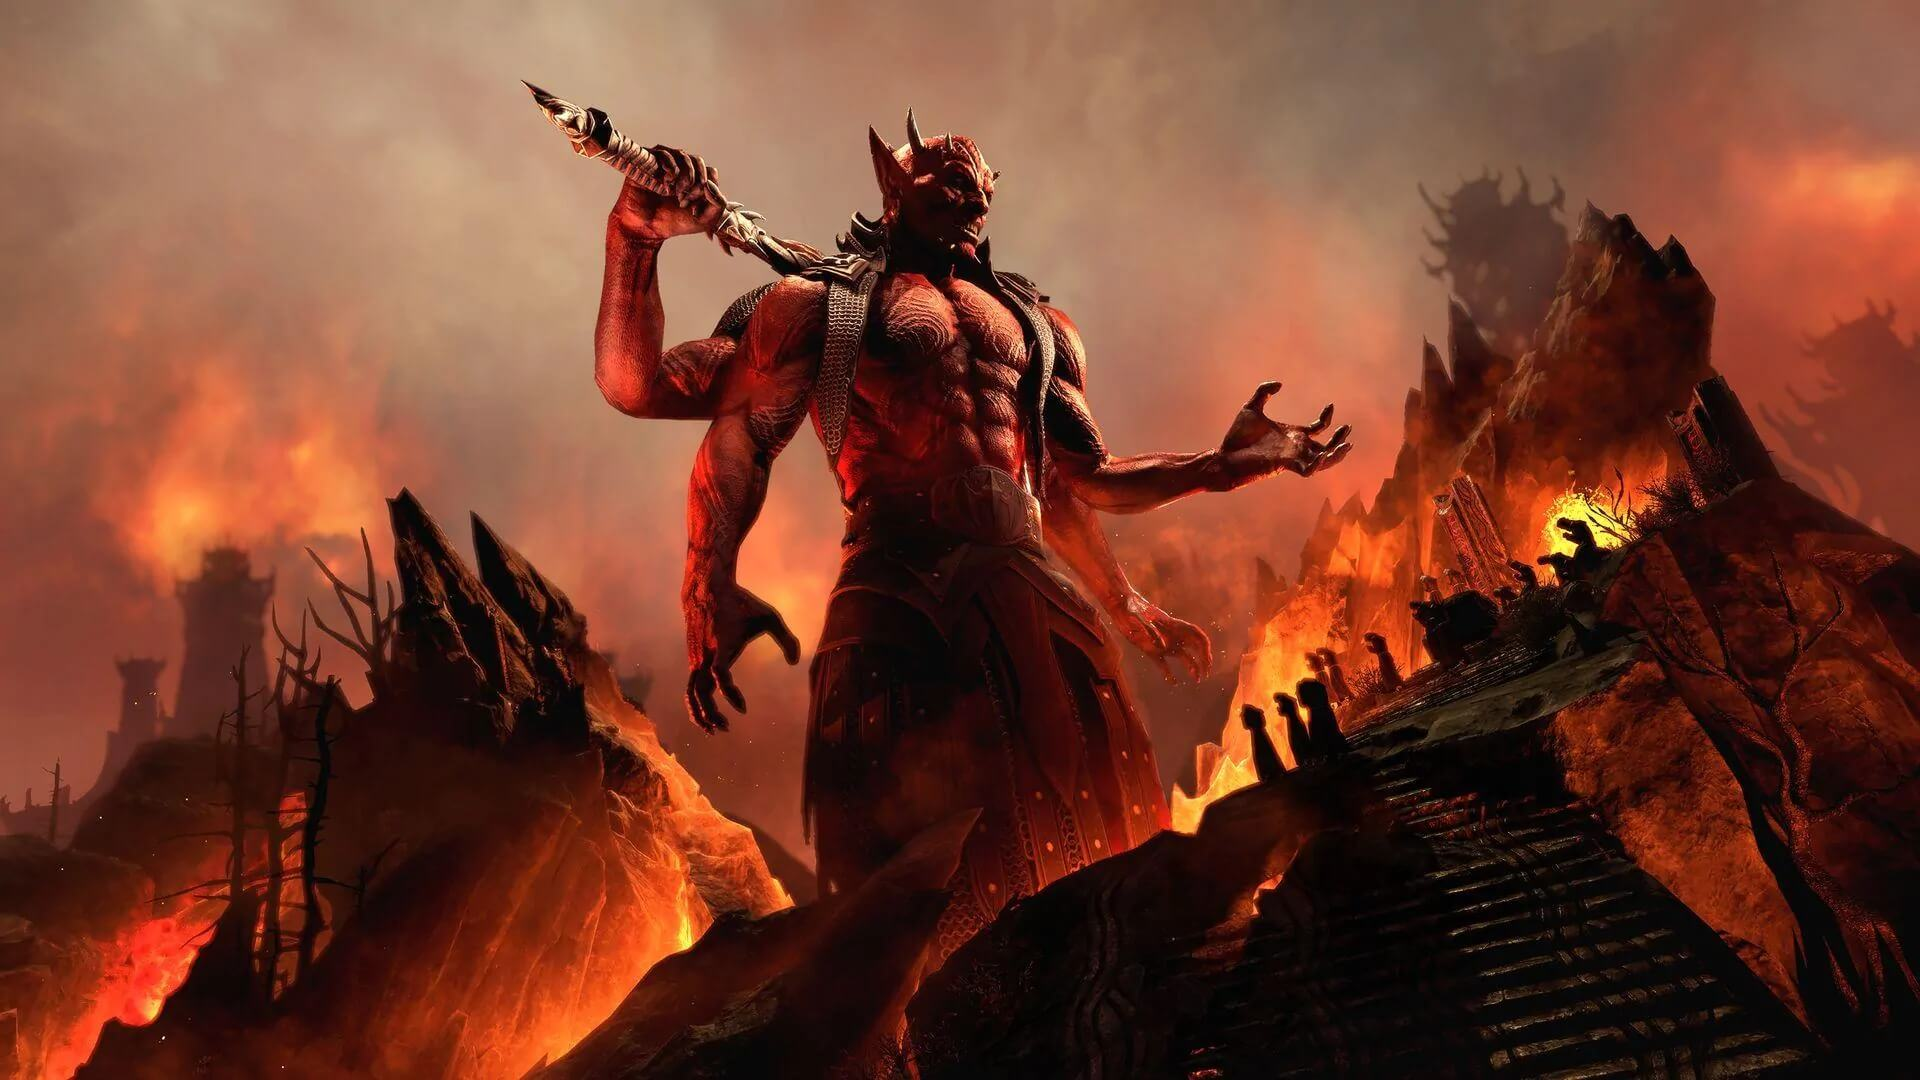 The Elder Scrolls Online: Blackwood PS4 Free Download